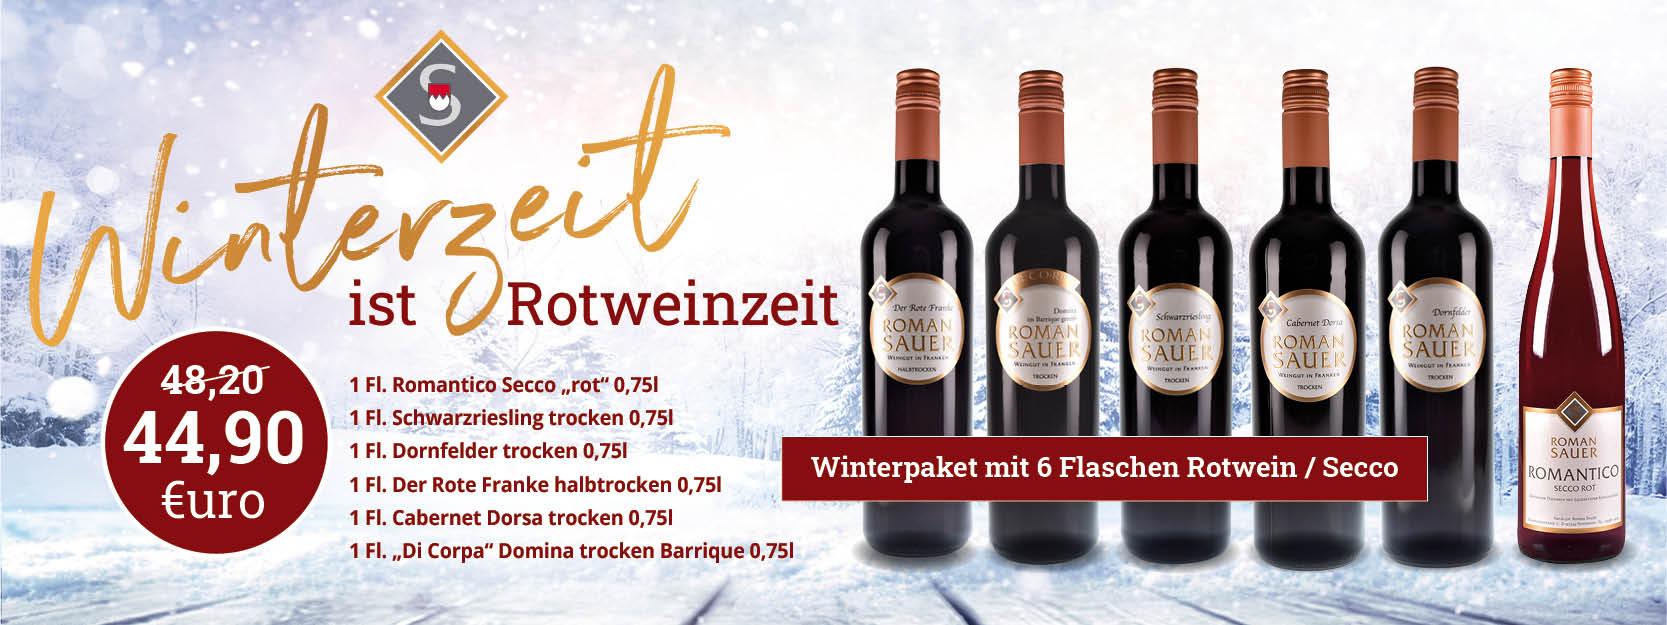 Winter Rotwein Paket